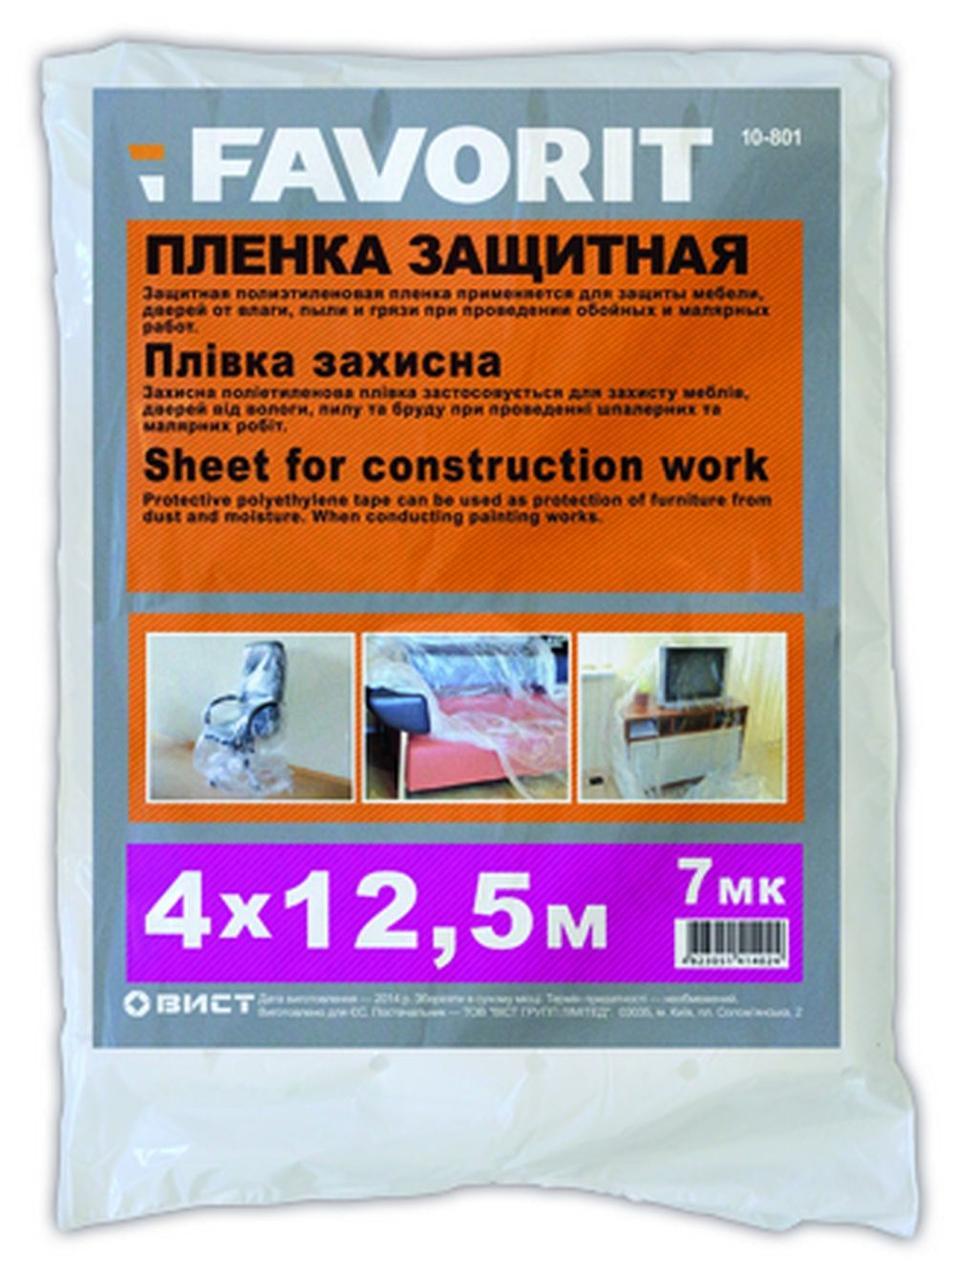 Пленка защитная 4х12,5м 7мкн